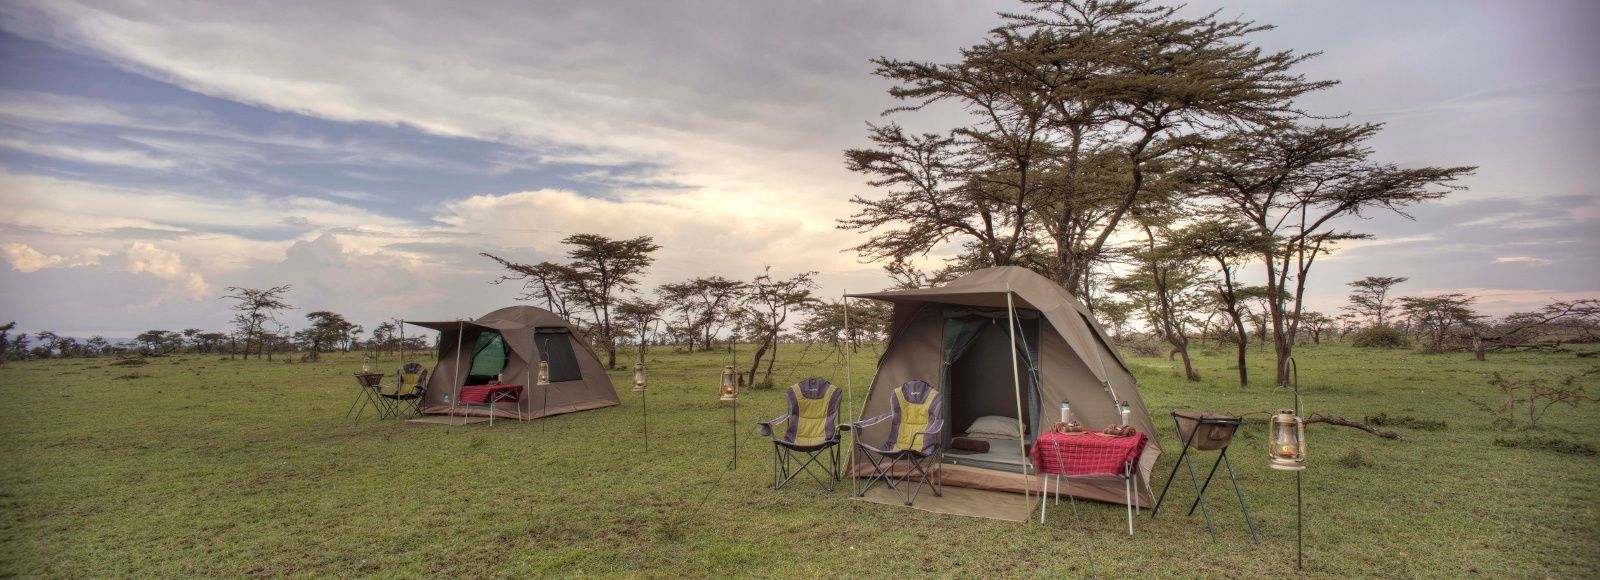 Kenia: Masai Mara, Wandersafaris & Traumstrände Urlaub 10